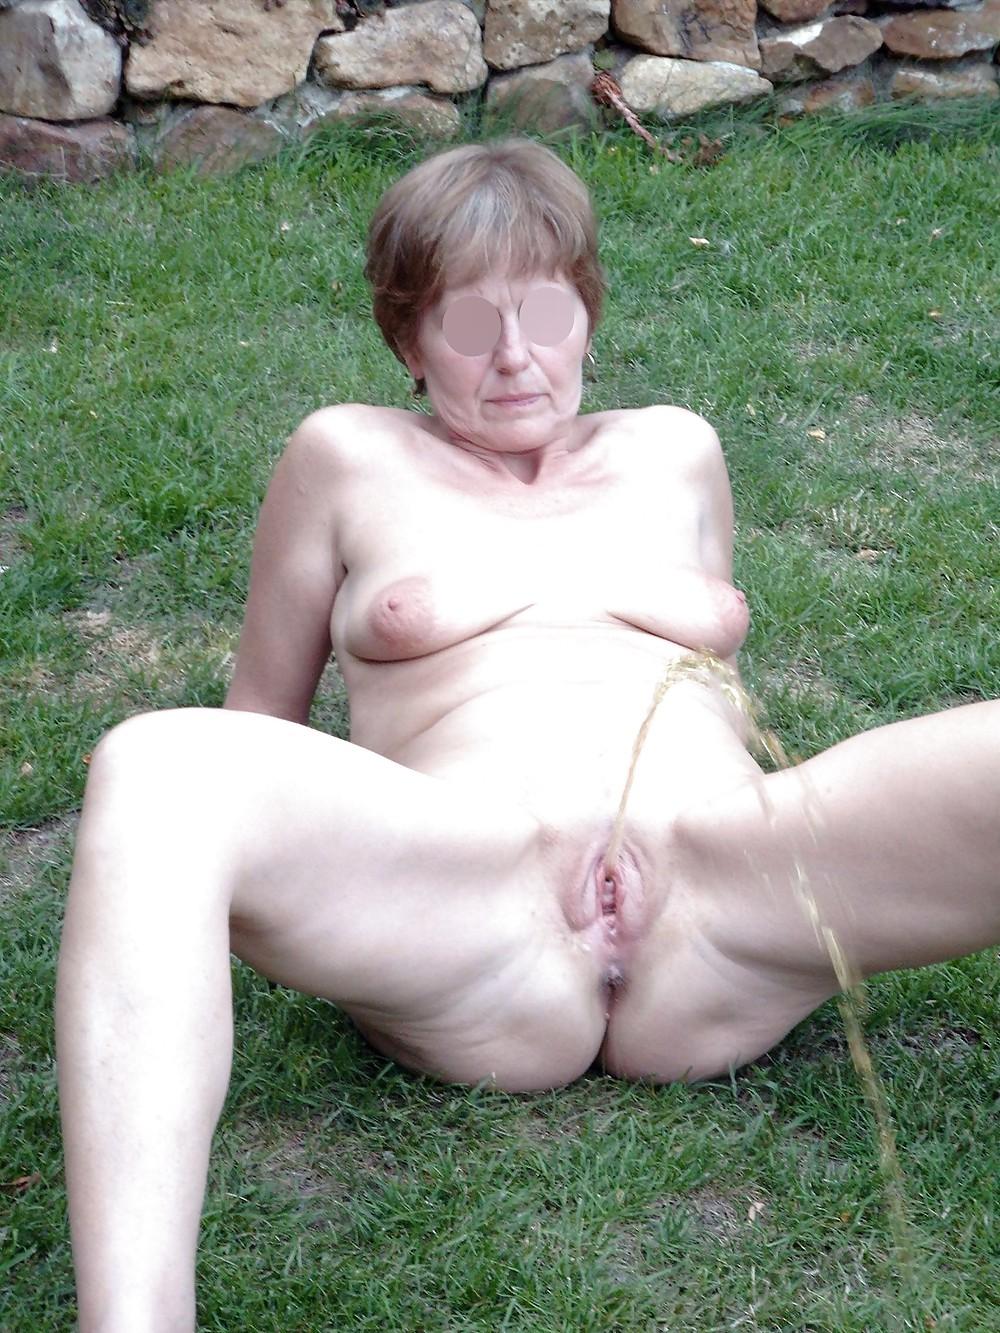 gta san nude pussy